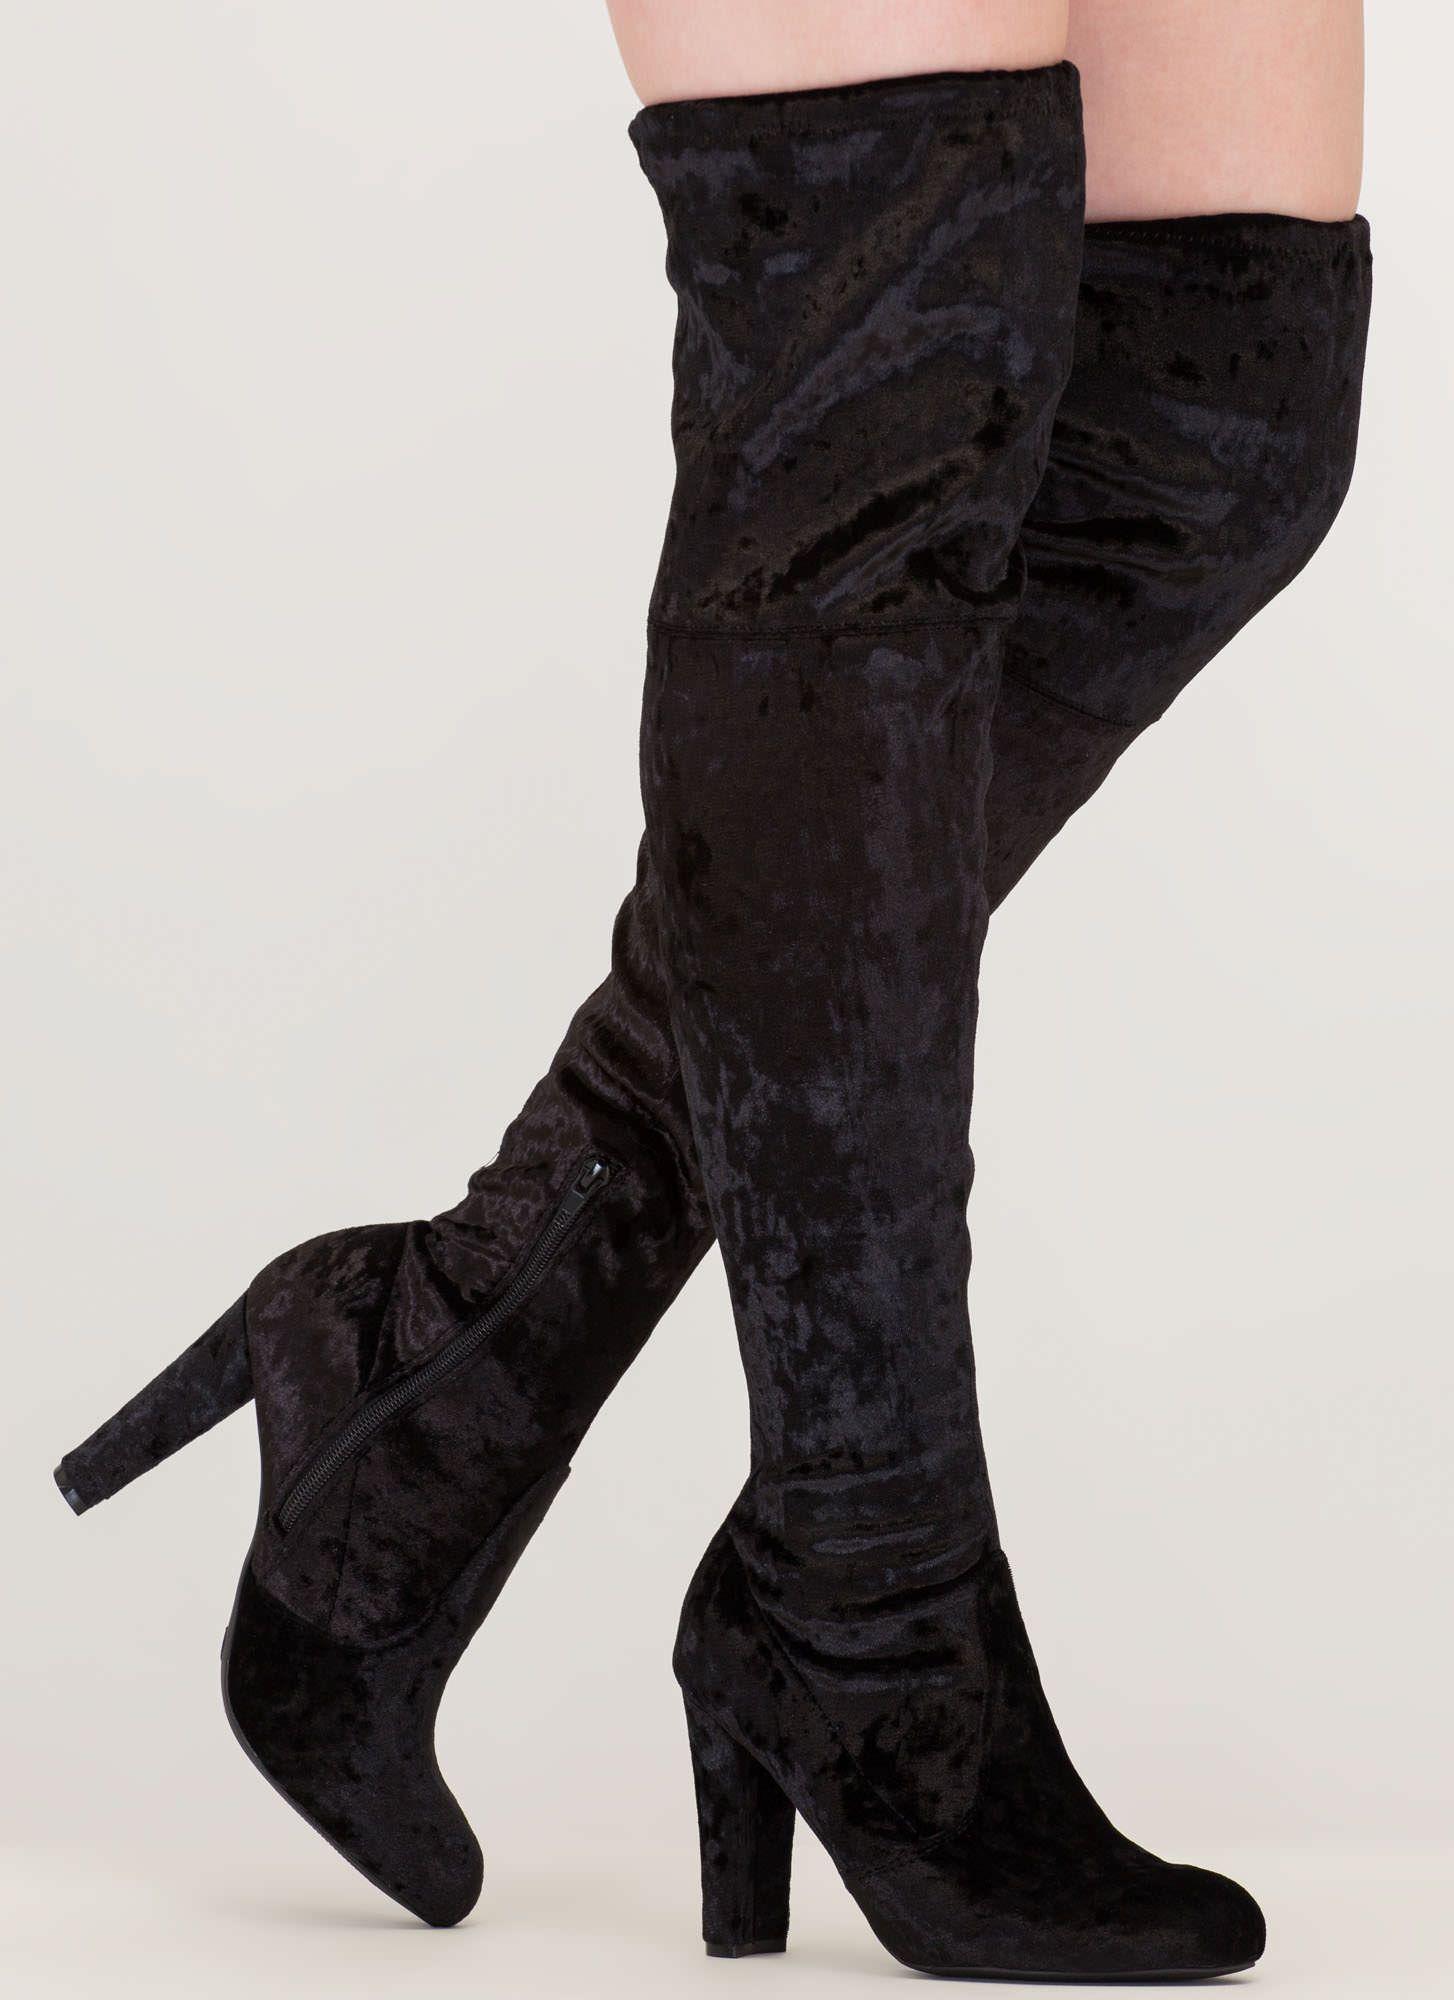 Black Velvet Thigh High Boots, Block